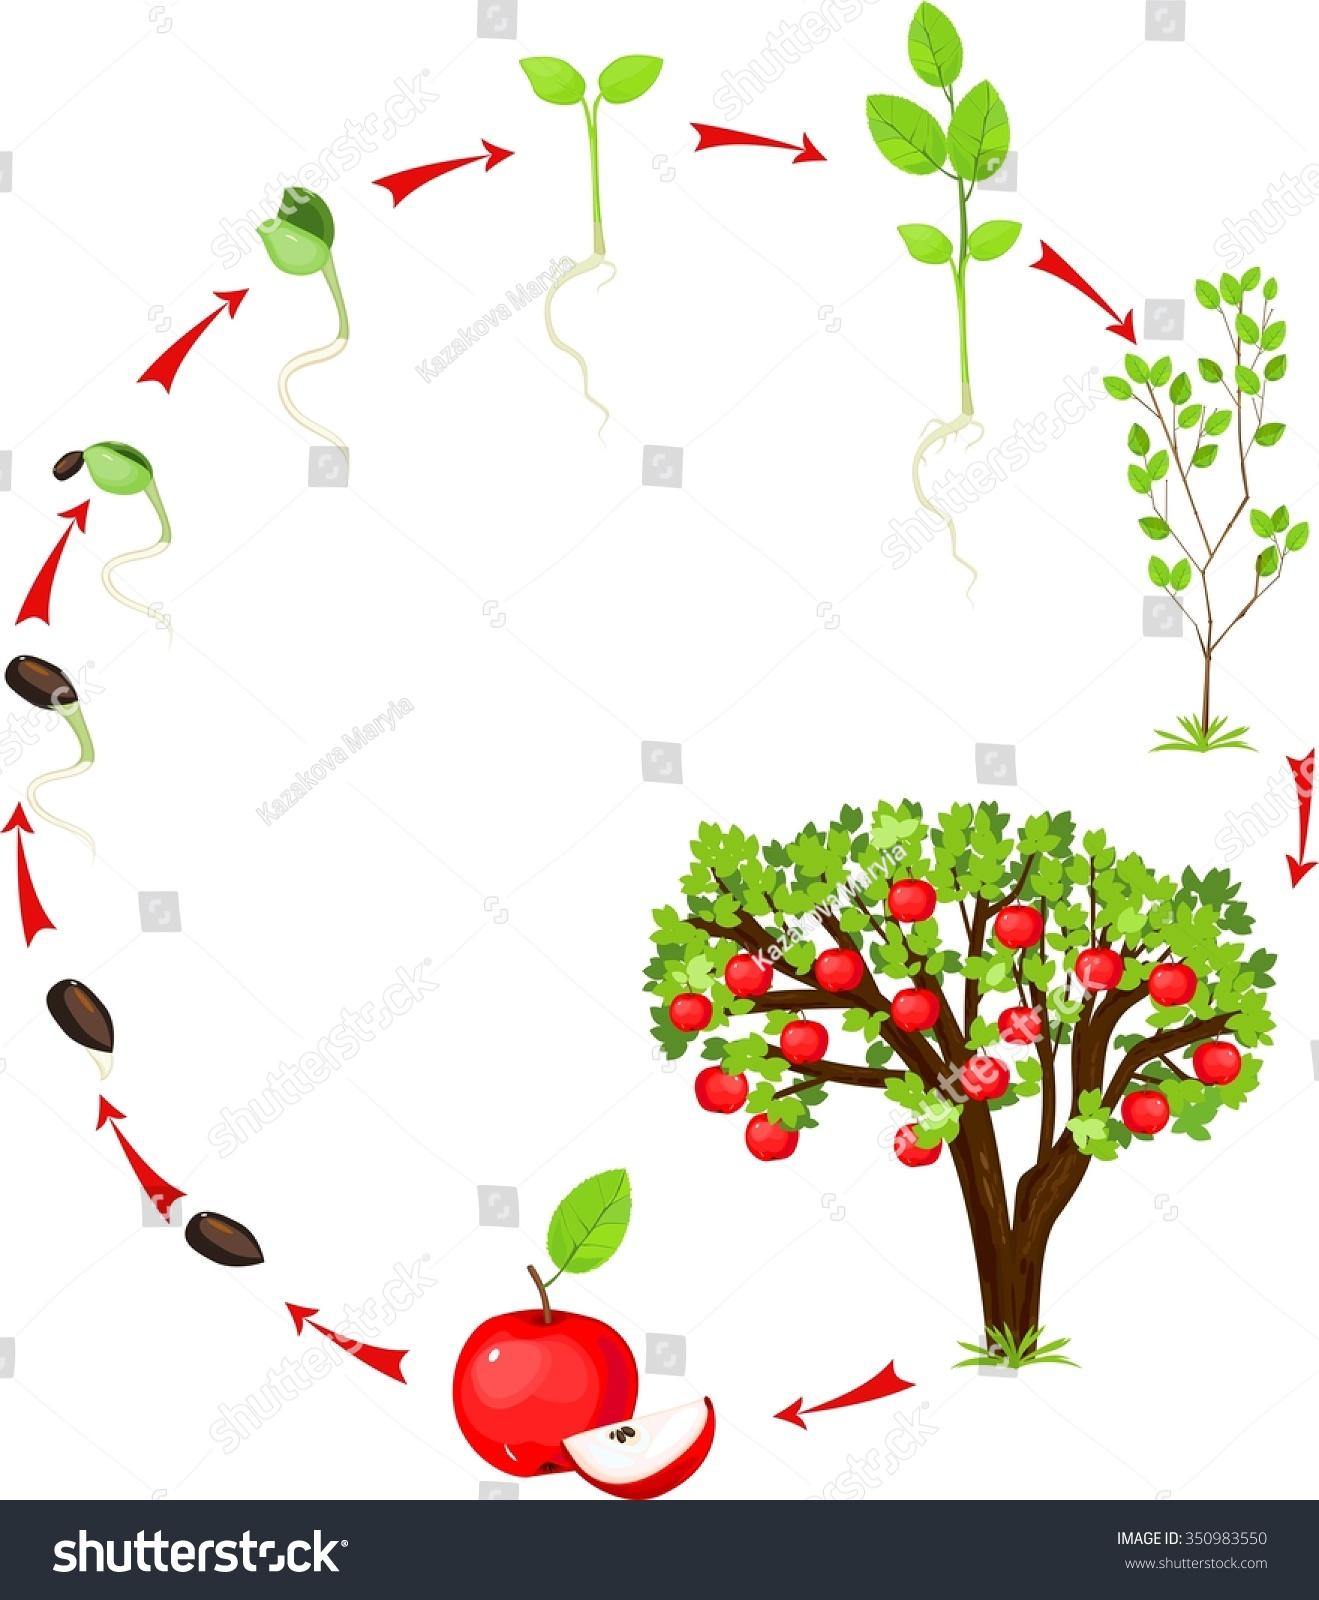 Life Cycle Apple Tree Stock Illustration